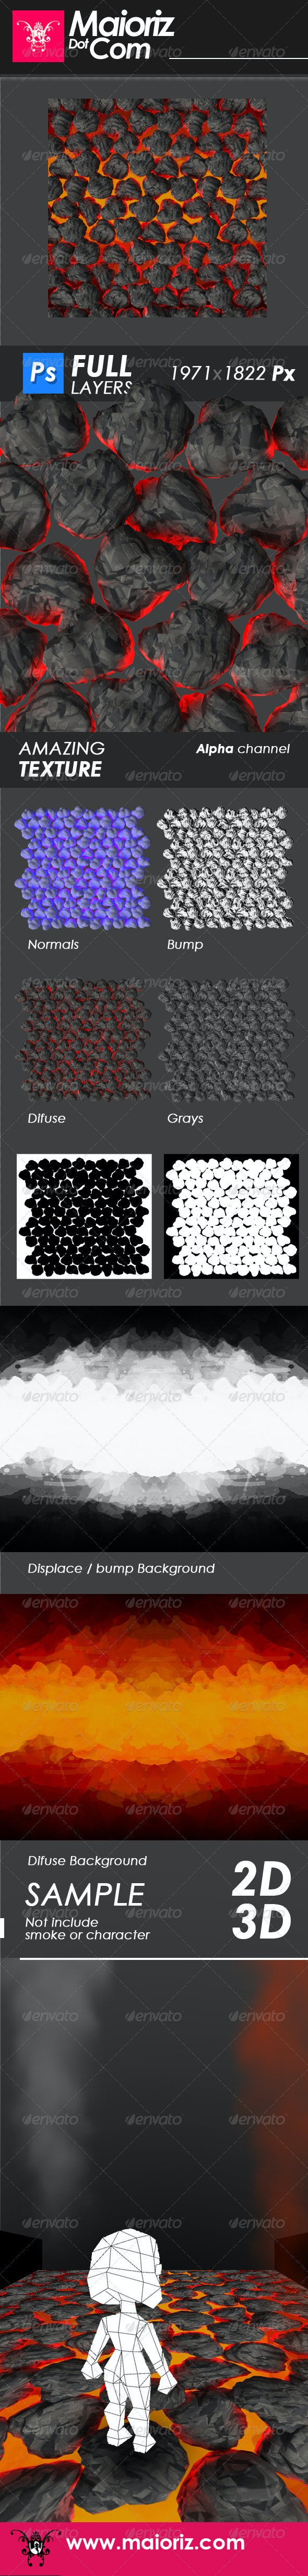 Fire Rocks Texture - Patterns Backgrounds